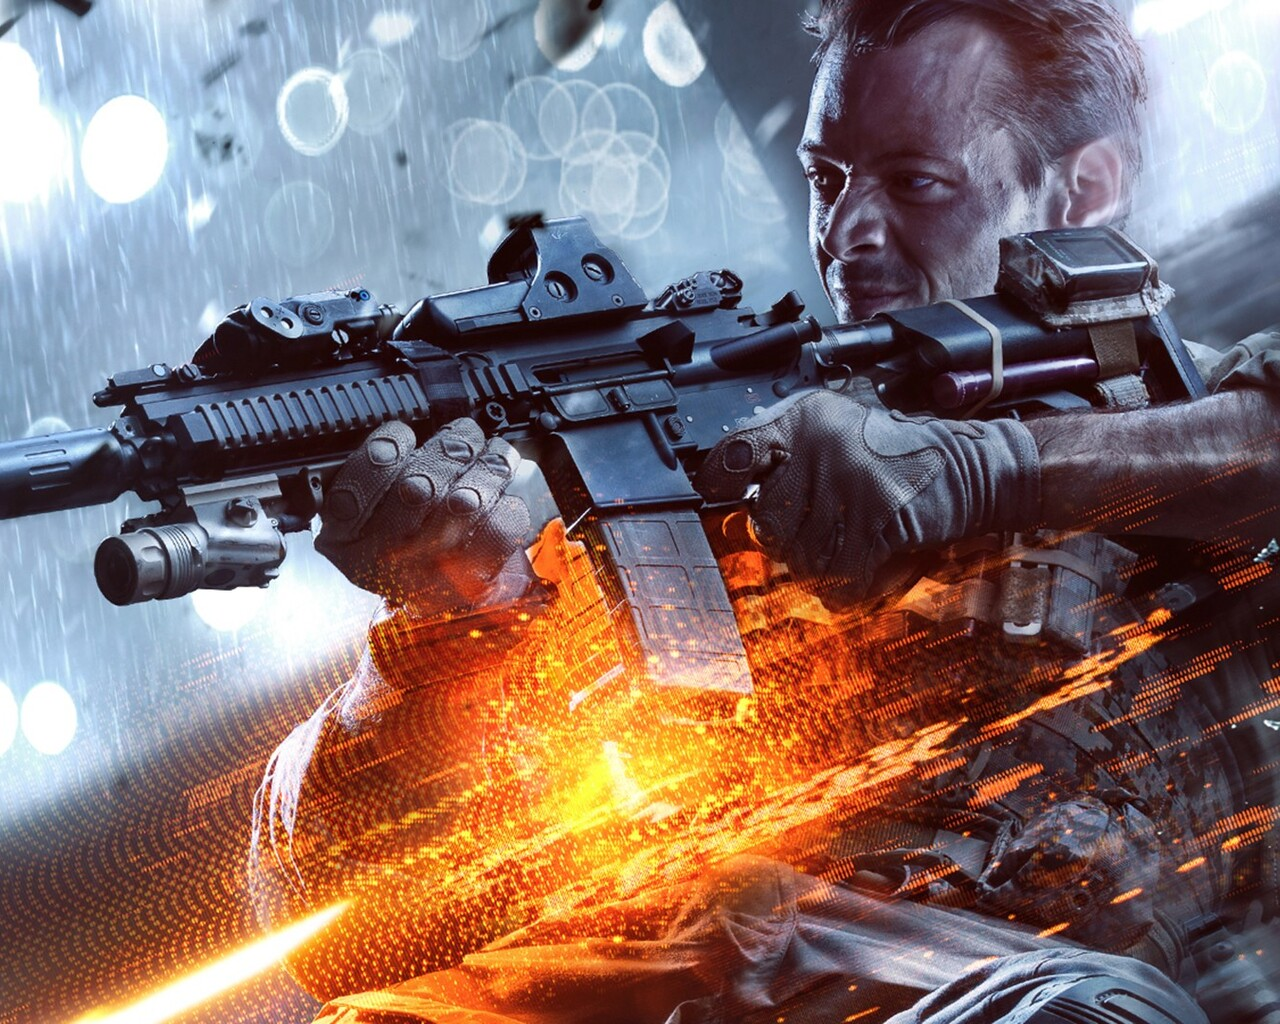 1280x1024 Battlefield 4 Pc Game 1280x1024 Resolution HD 4k